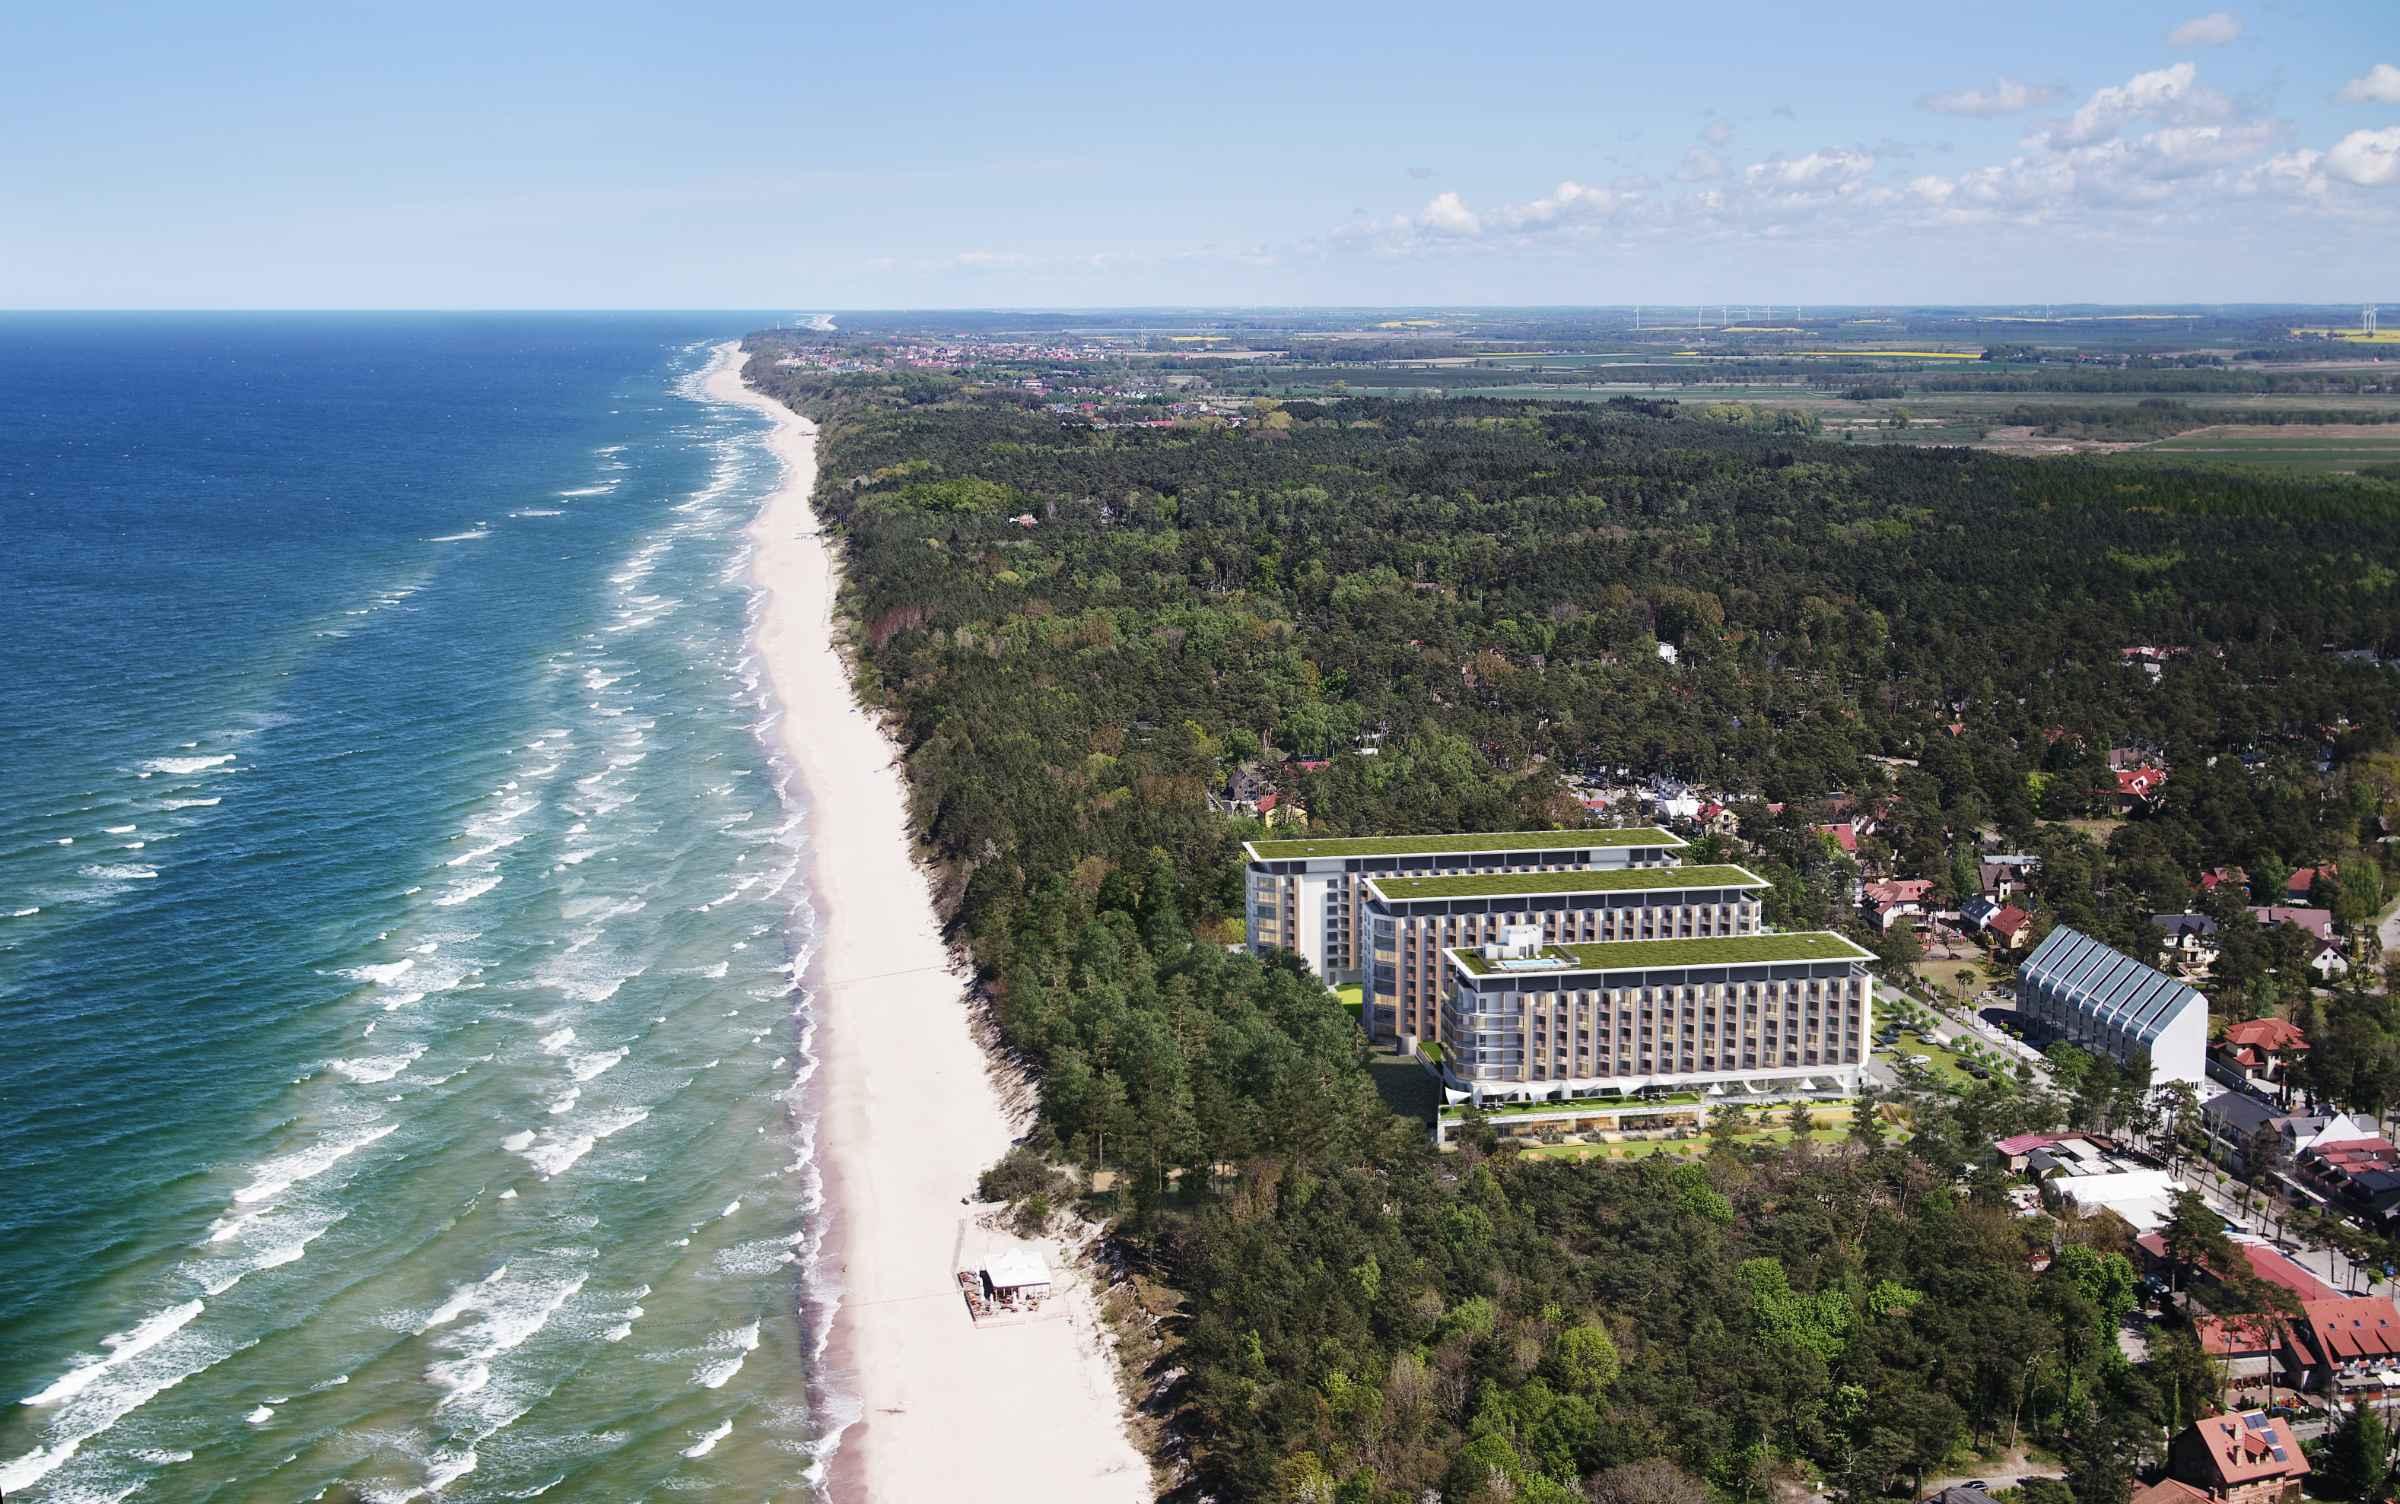 hilton-garden-in-pobierowo-vhmhm-hotel